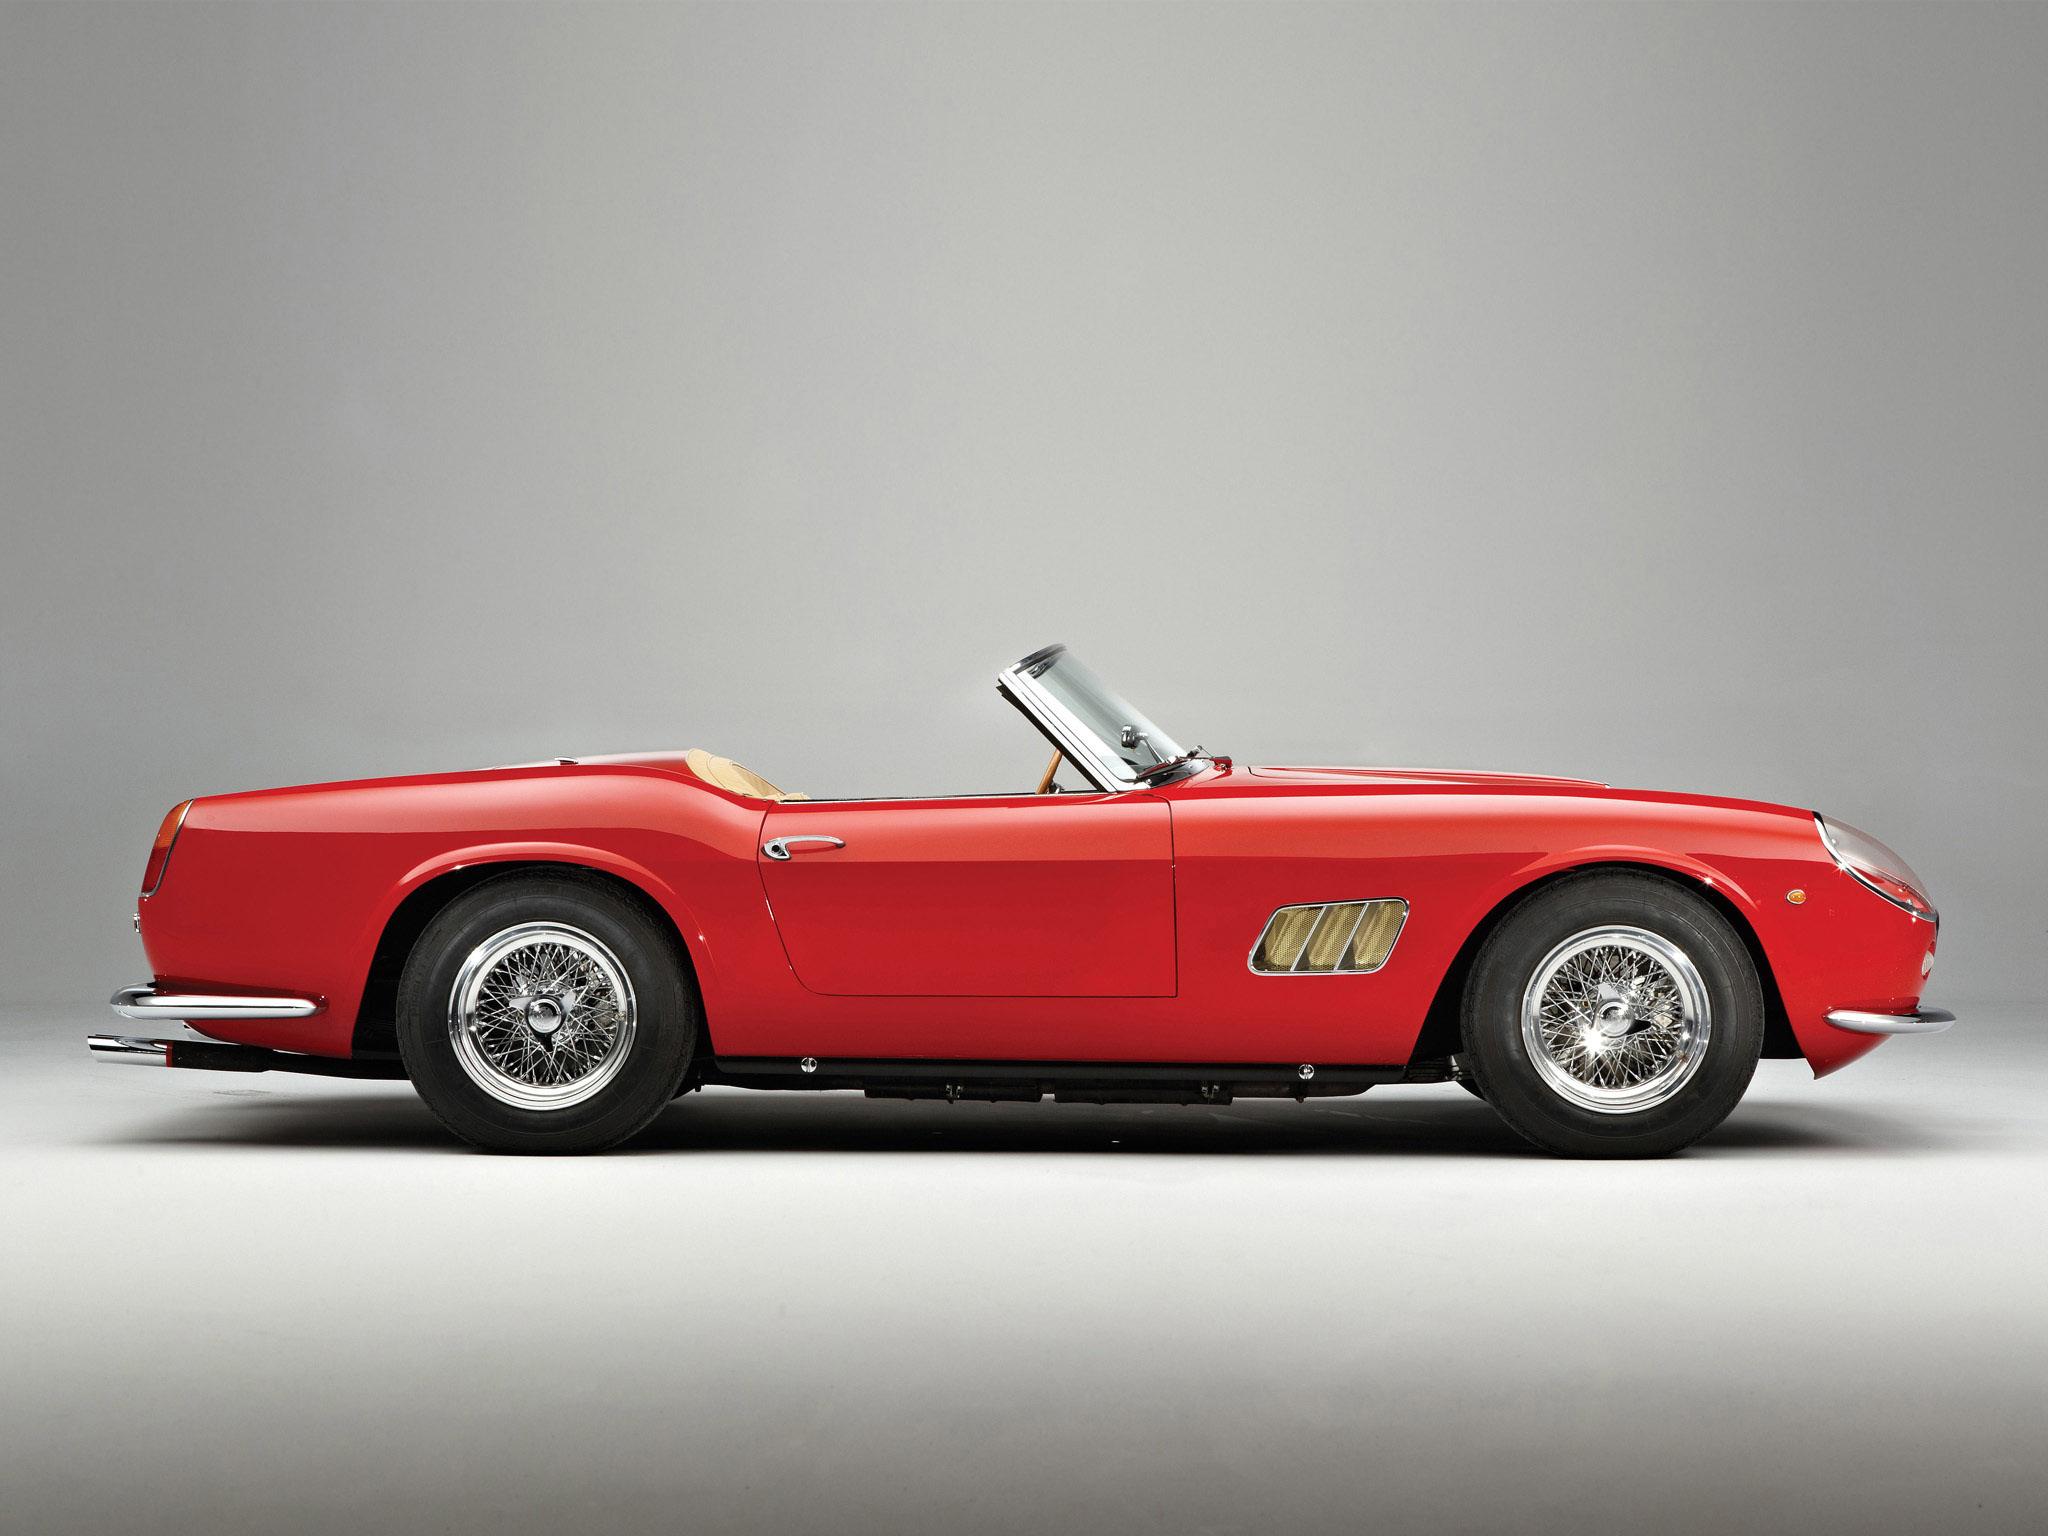 ferrari 250 gt swb california spyder 1960 1963 ferrari 250 gt swb. Cars Review. Best American Auto & Cars Review